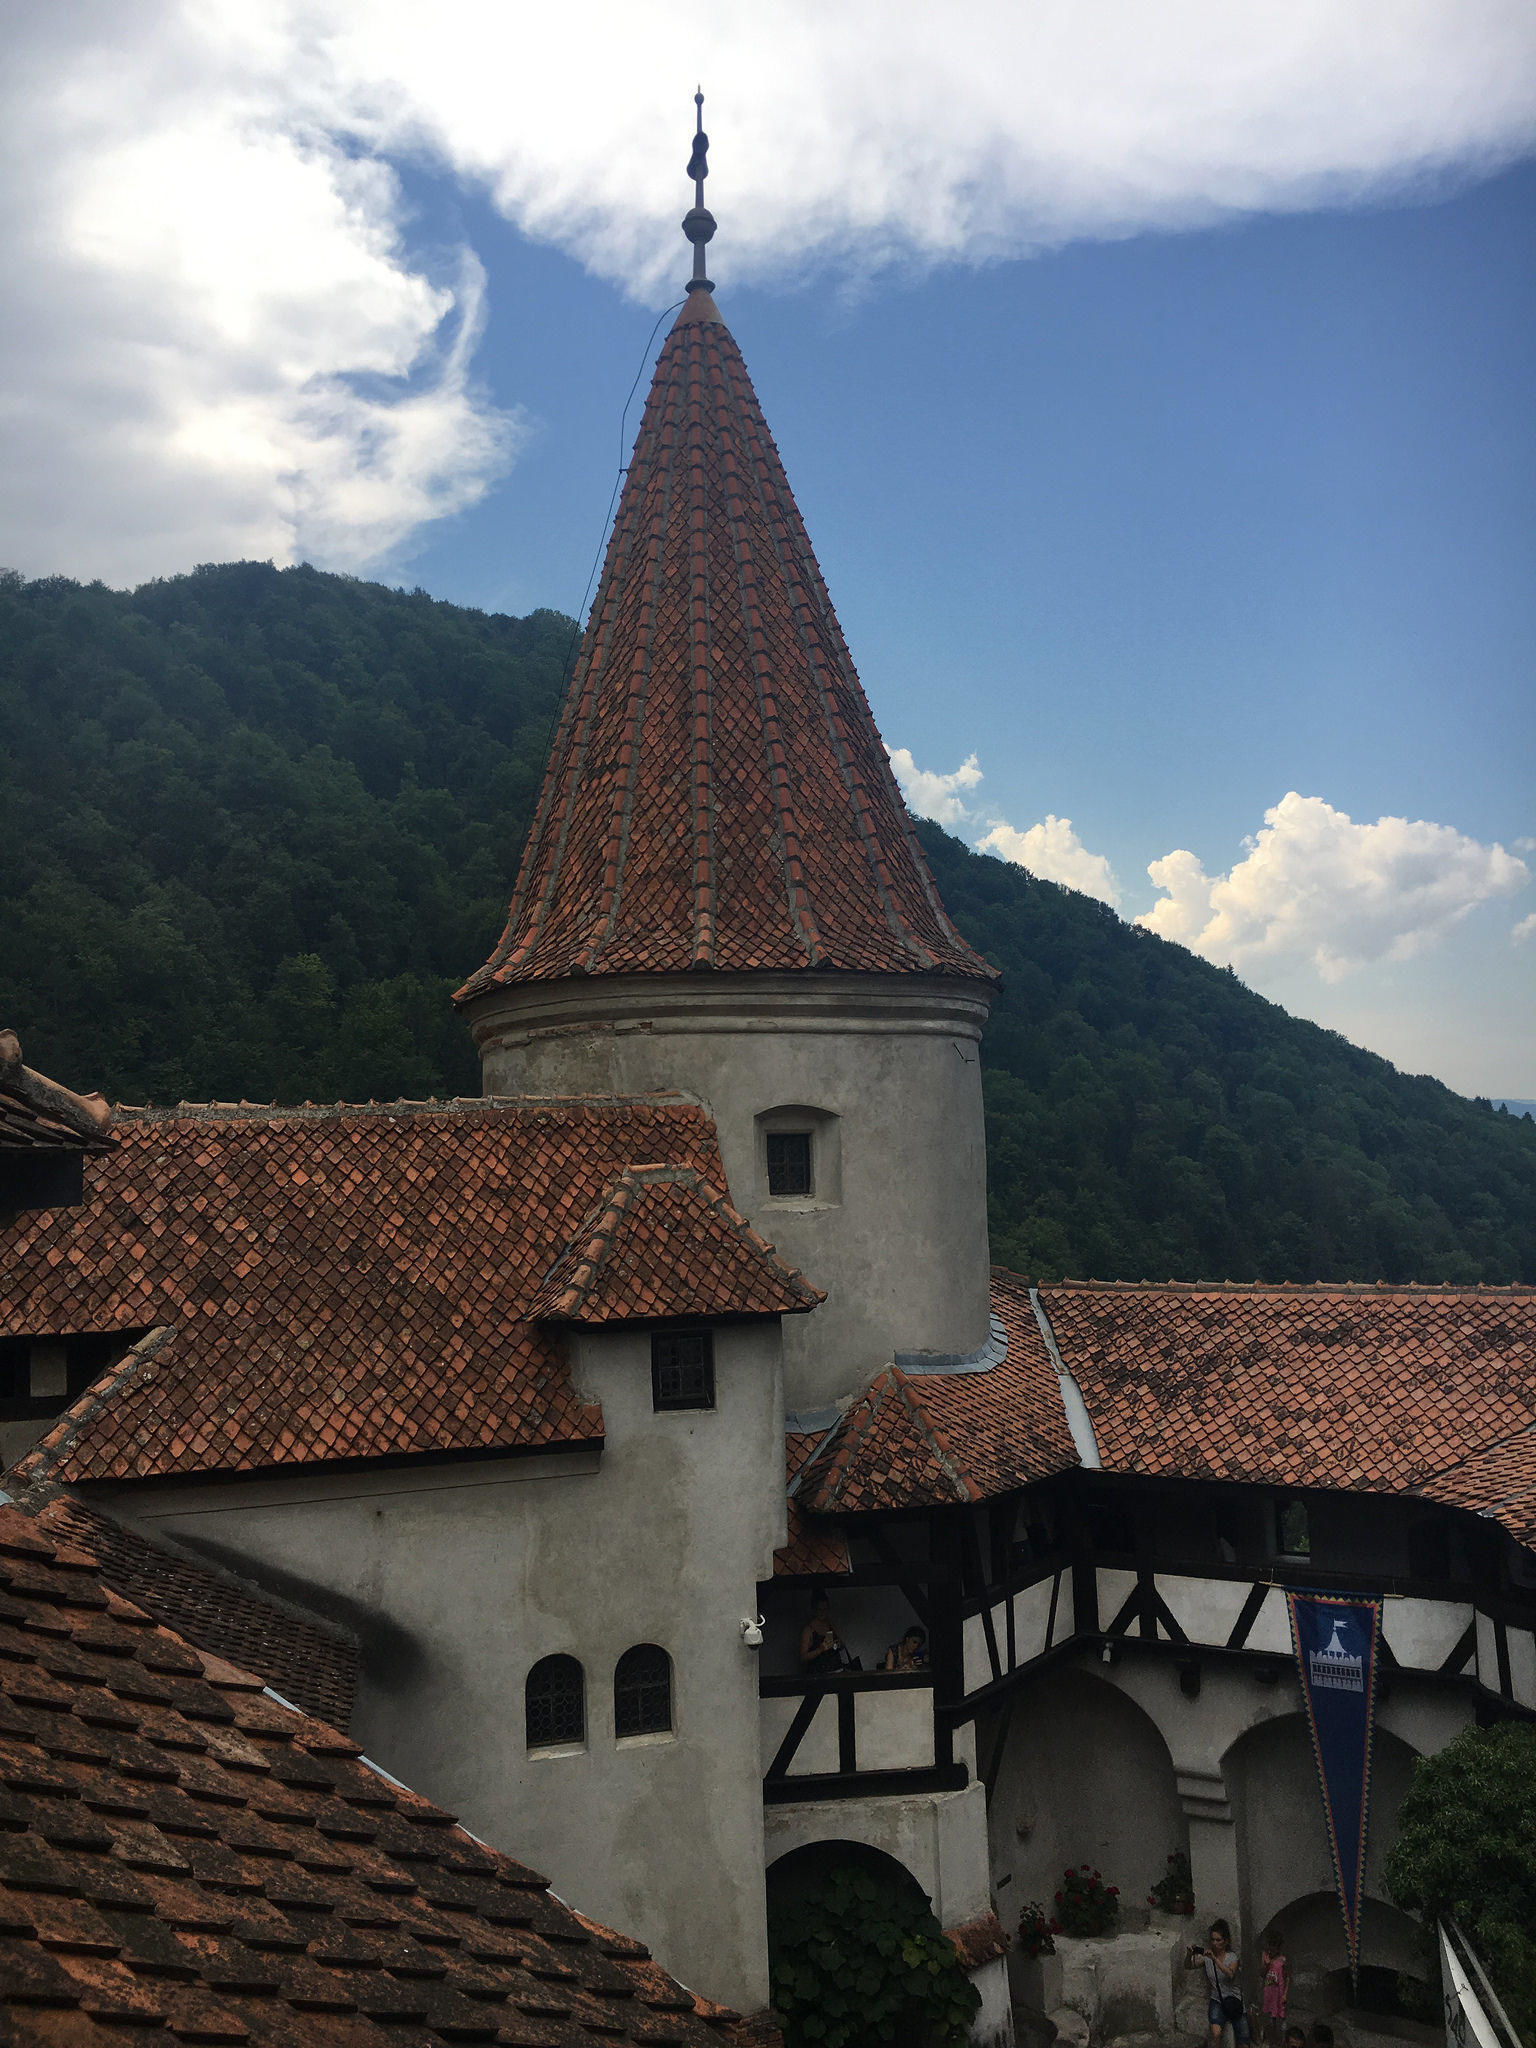 Full-Day Private Tour from Bucharest to Transylvania: Sinaia Castle, Dracula's Castle, Rasnov Fortress, Dino Park and Valea Cetatii Cave